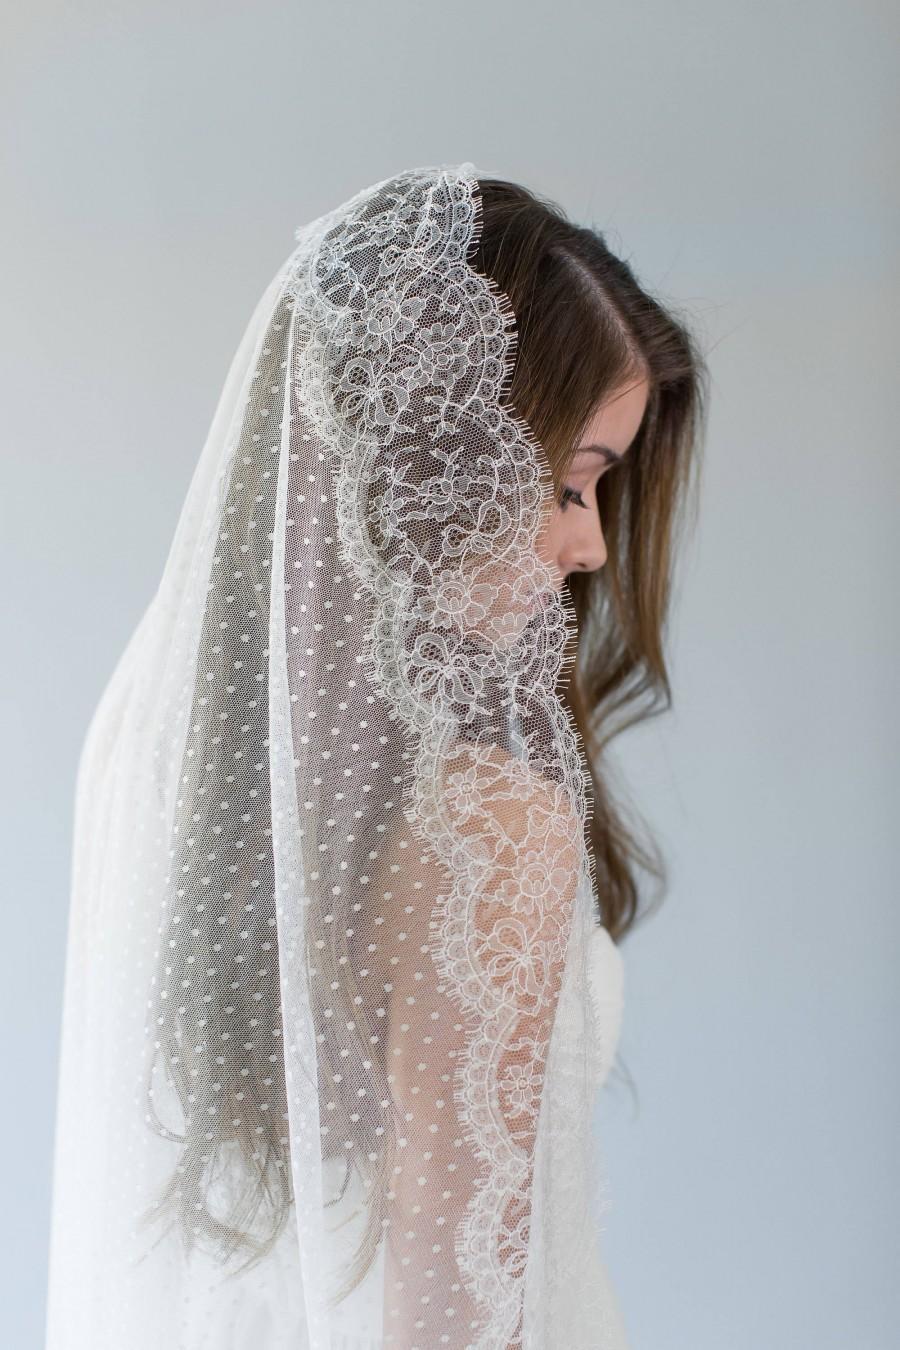 Mariage - Mantilla Veil, Ivory Lace Wedding Veil, Dotted Circle Veil, Polka Dot Bridal Veil, Swiss Dot Veil